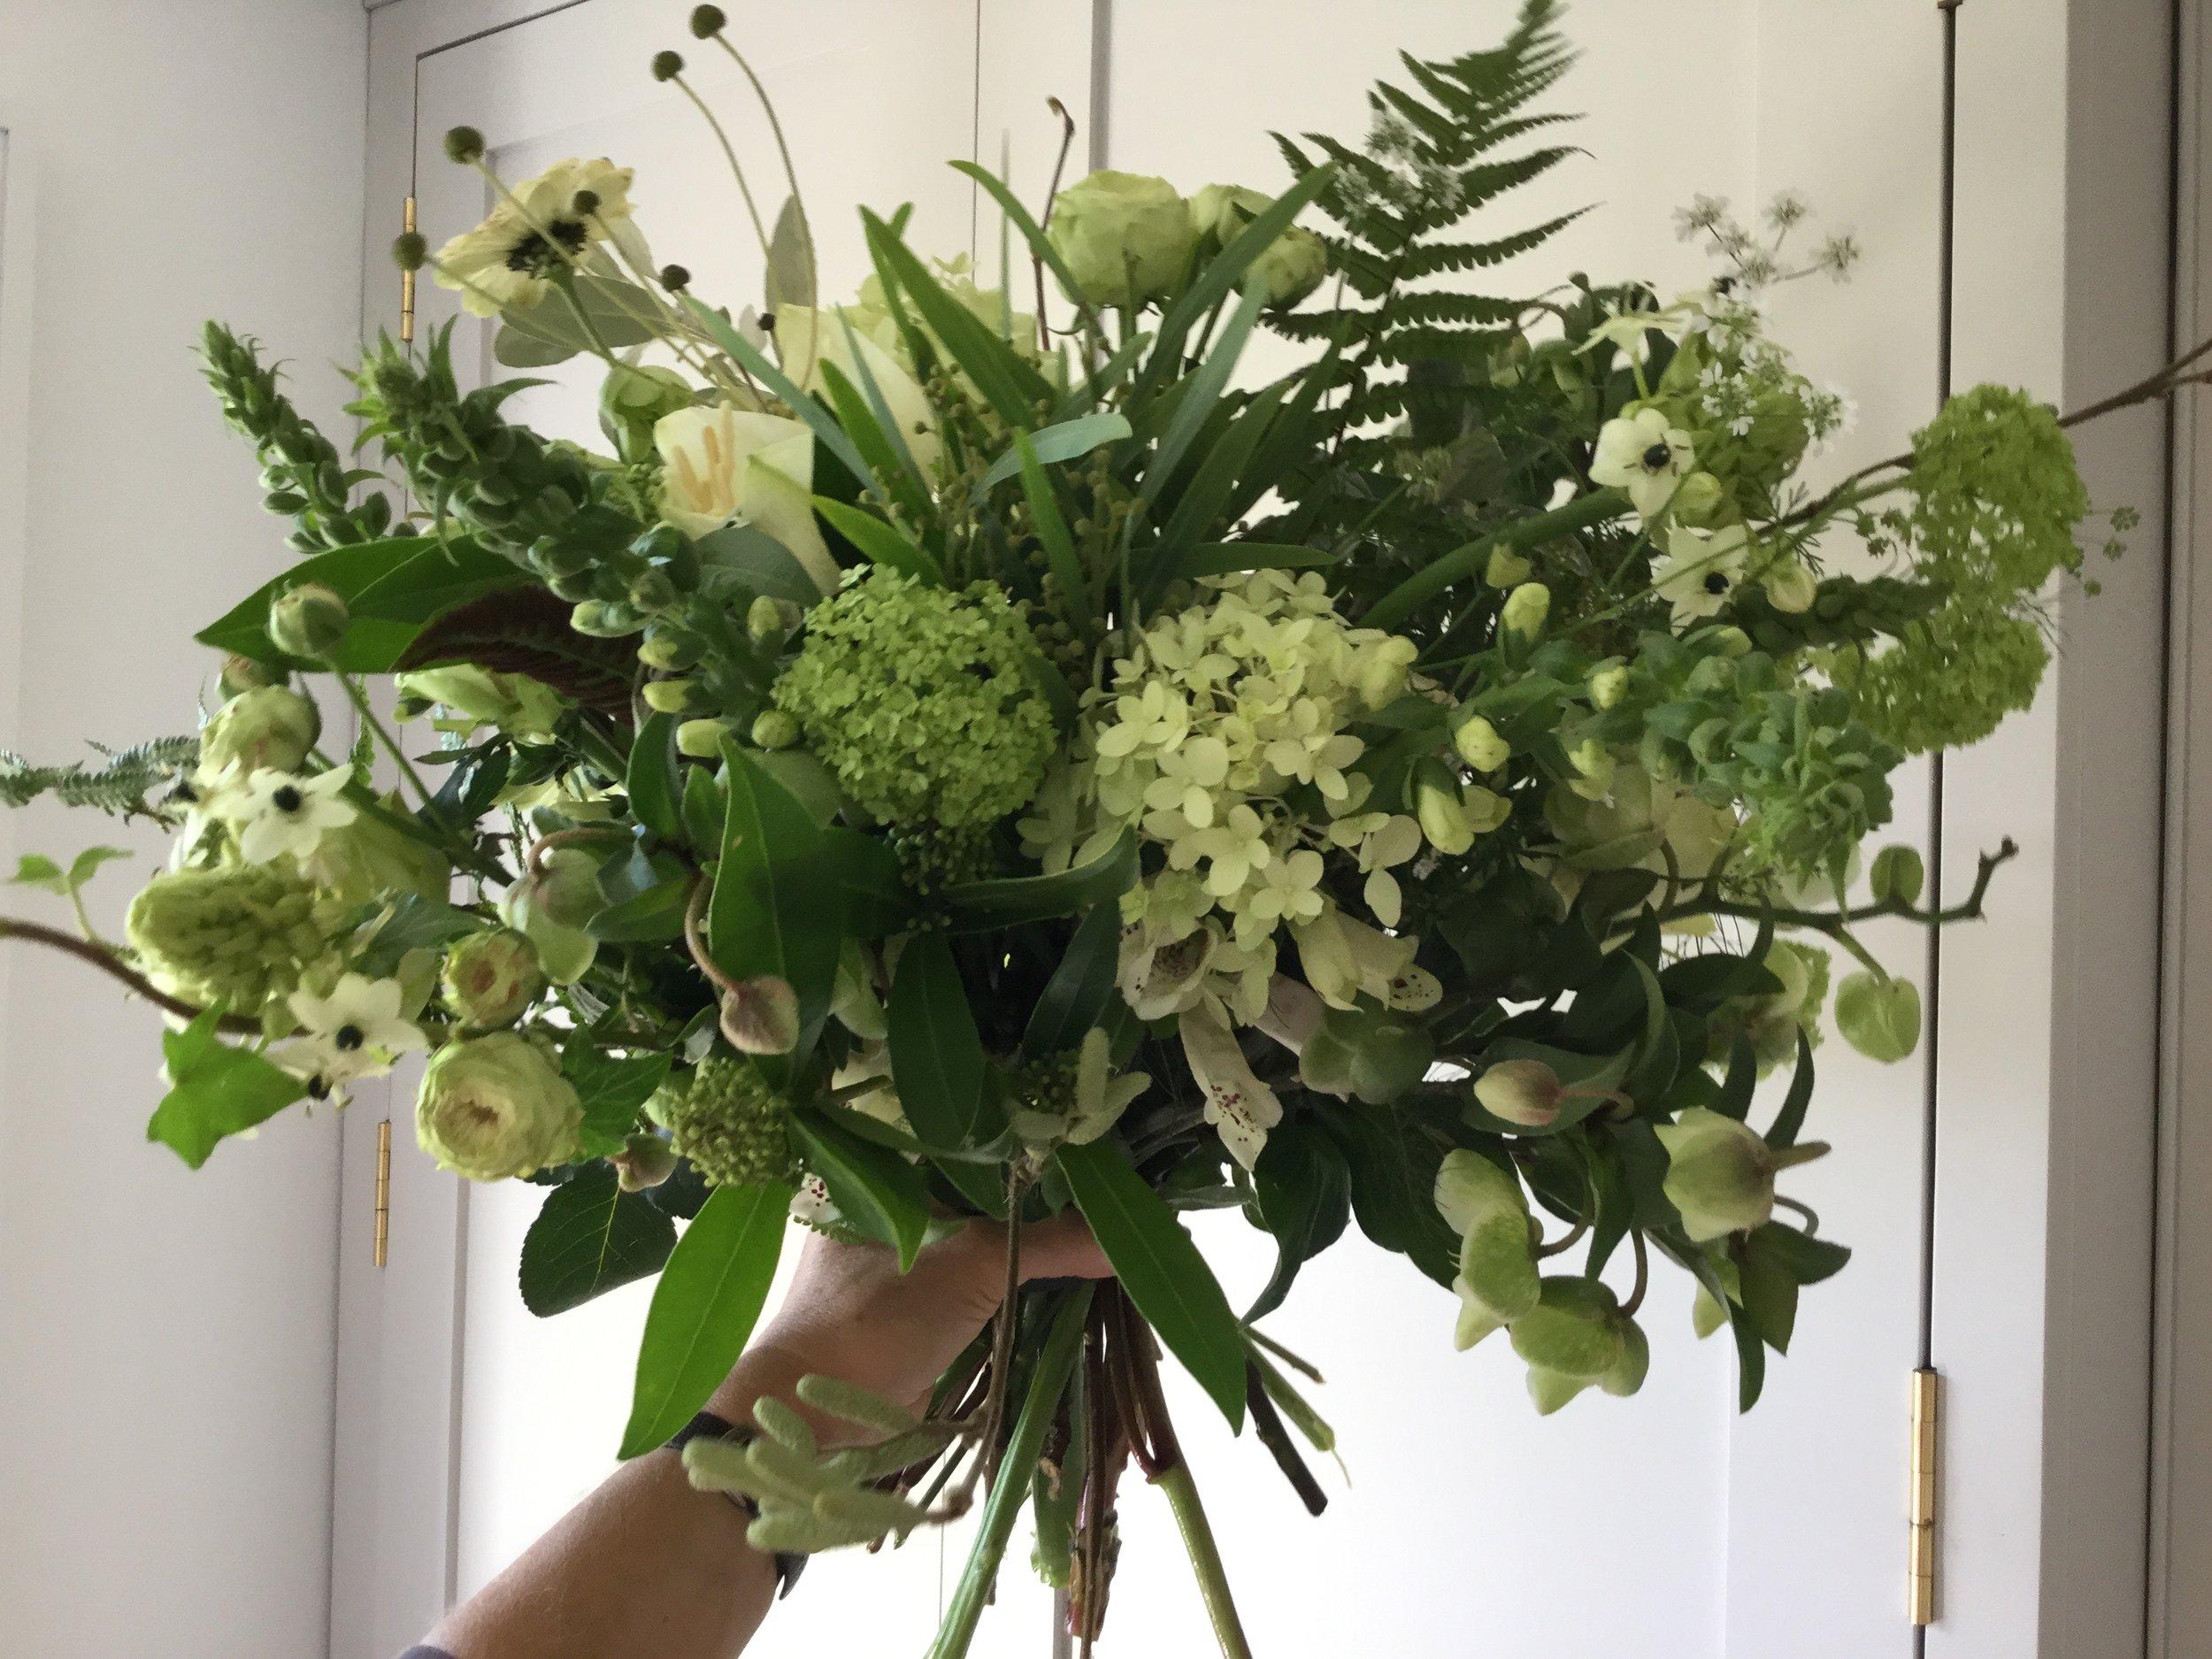 natural form bouquet. hadleigh, suffolk